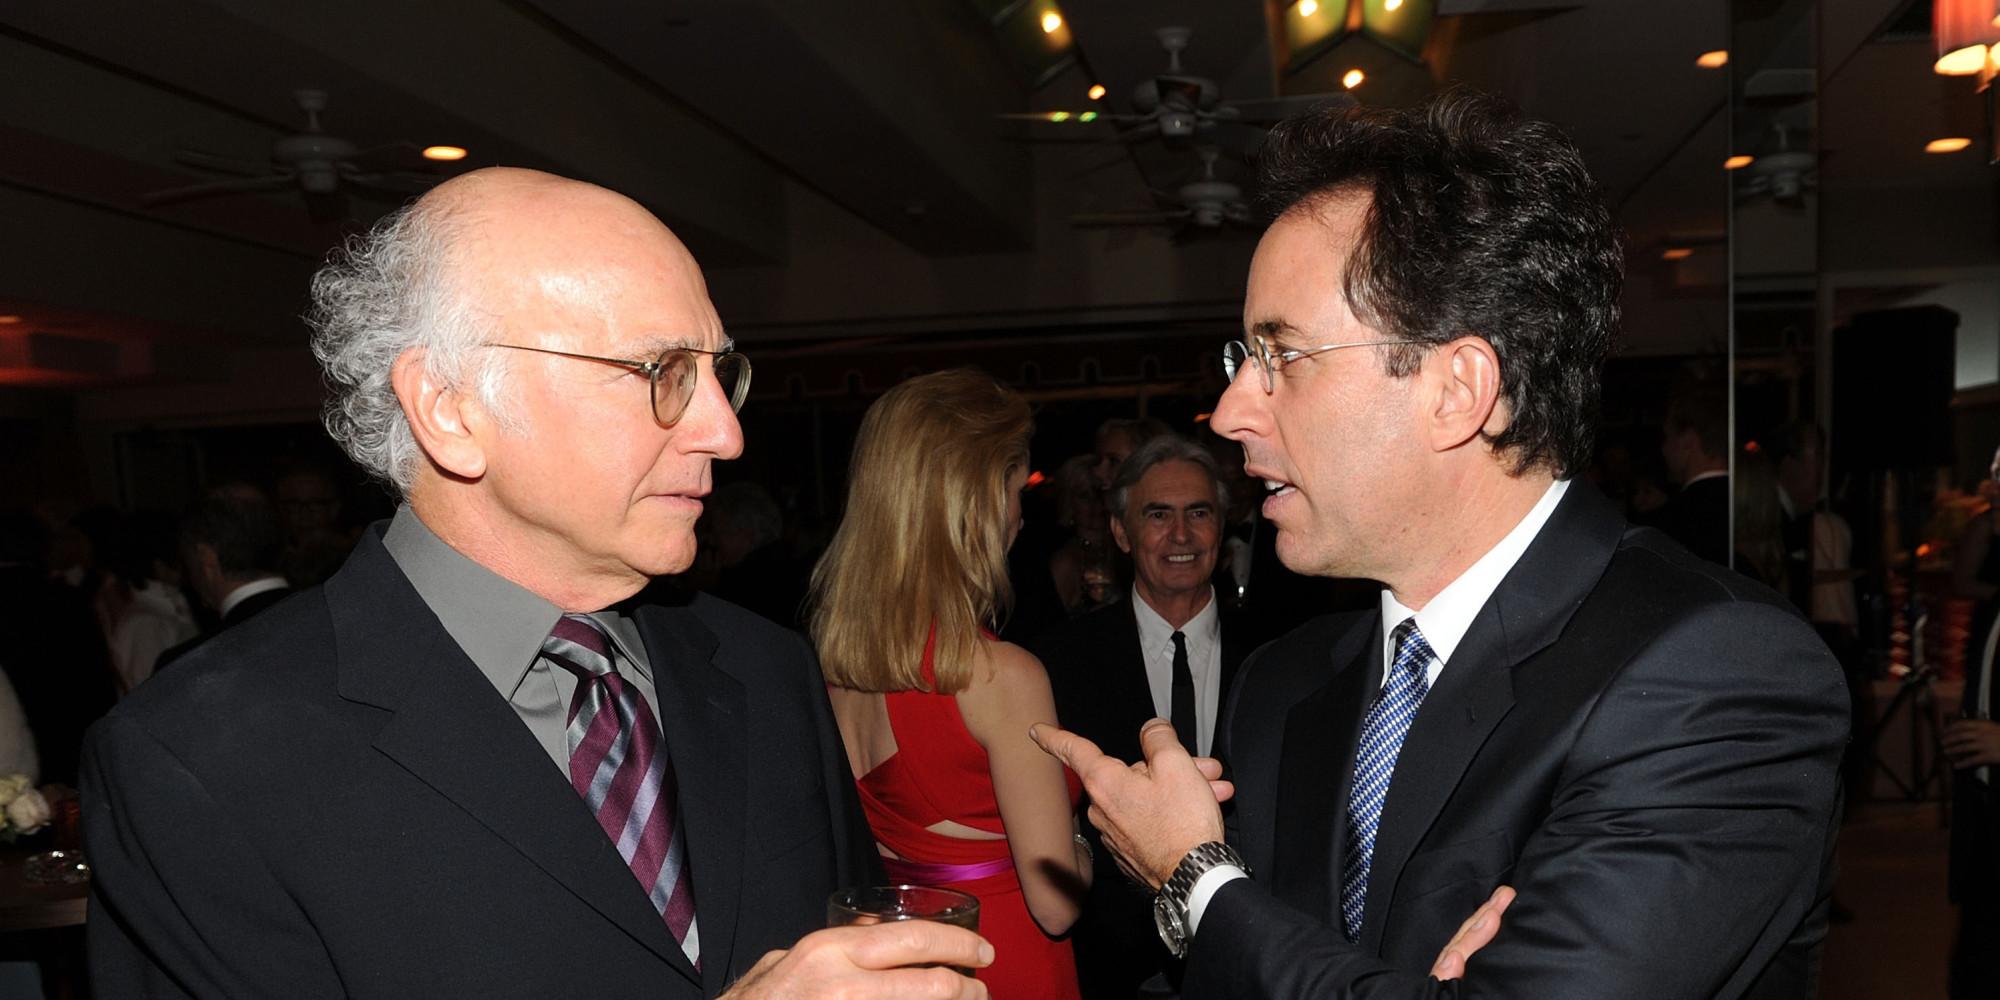 Secret Seinfeld-David Script Maybe Broadway Play | HuffPost